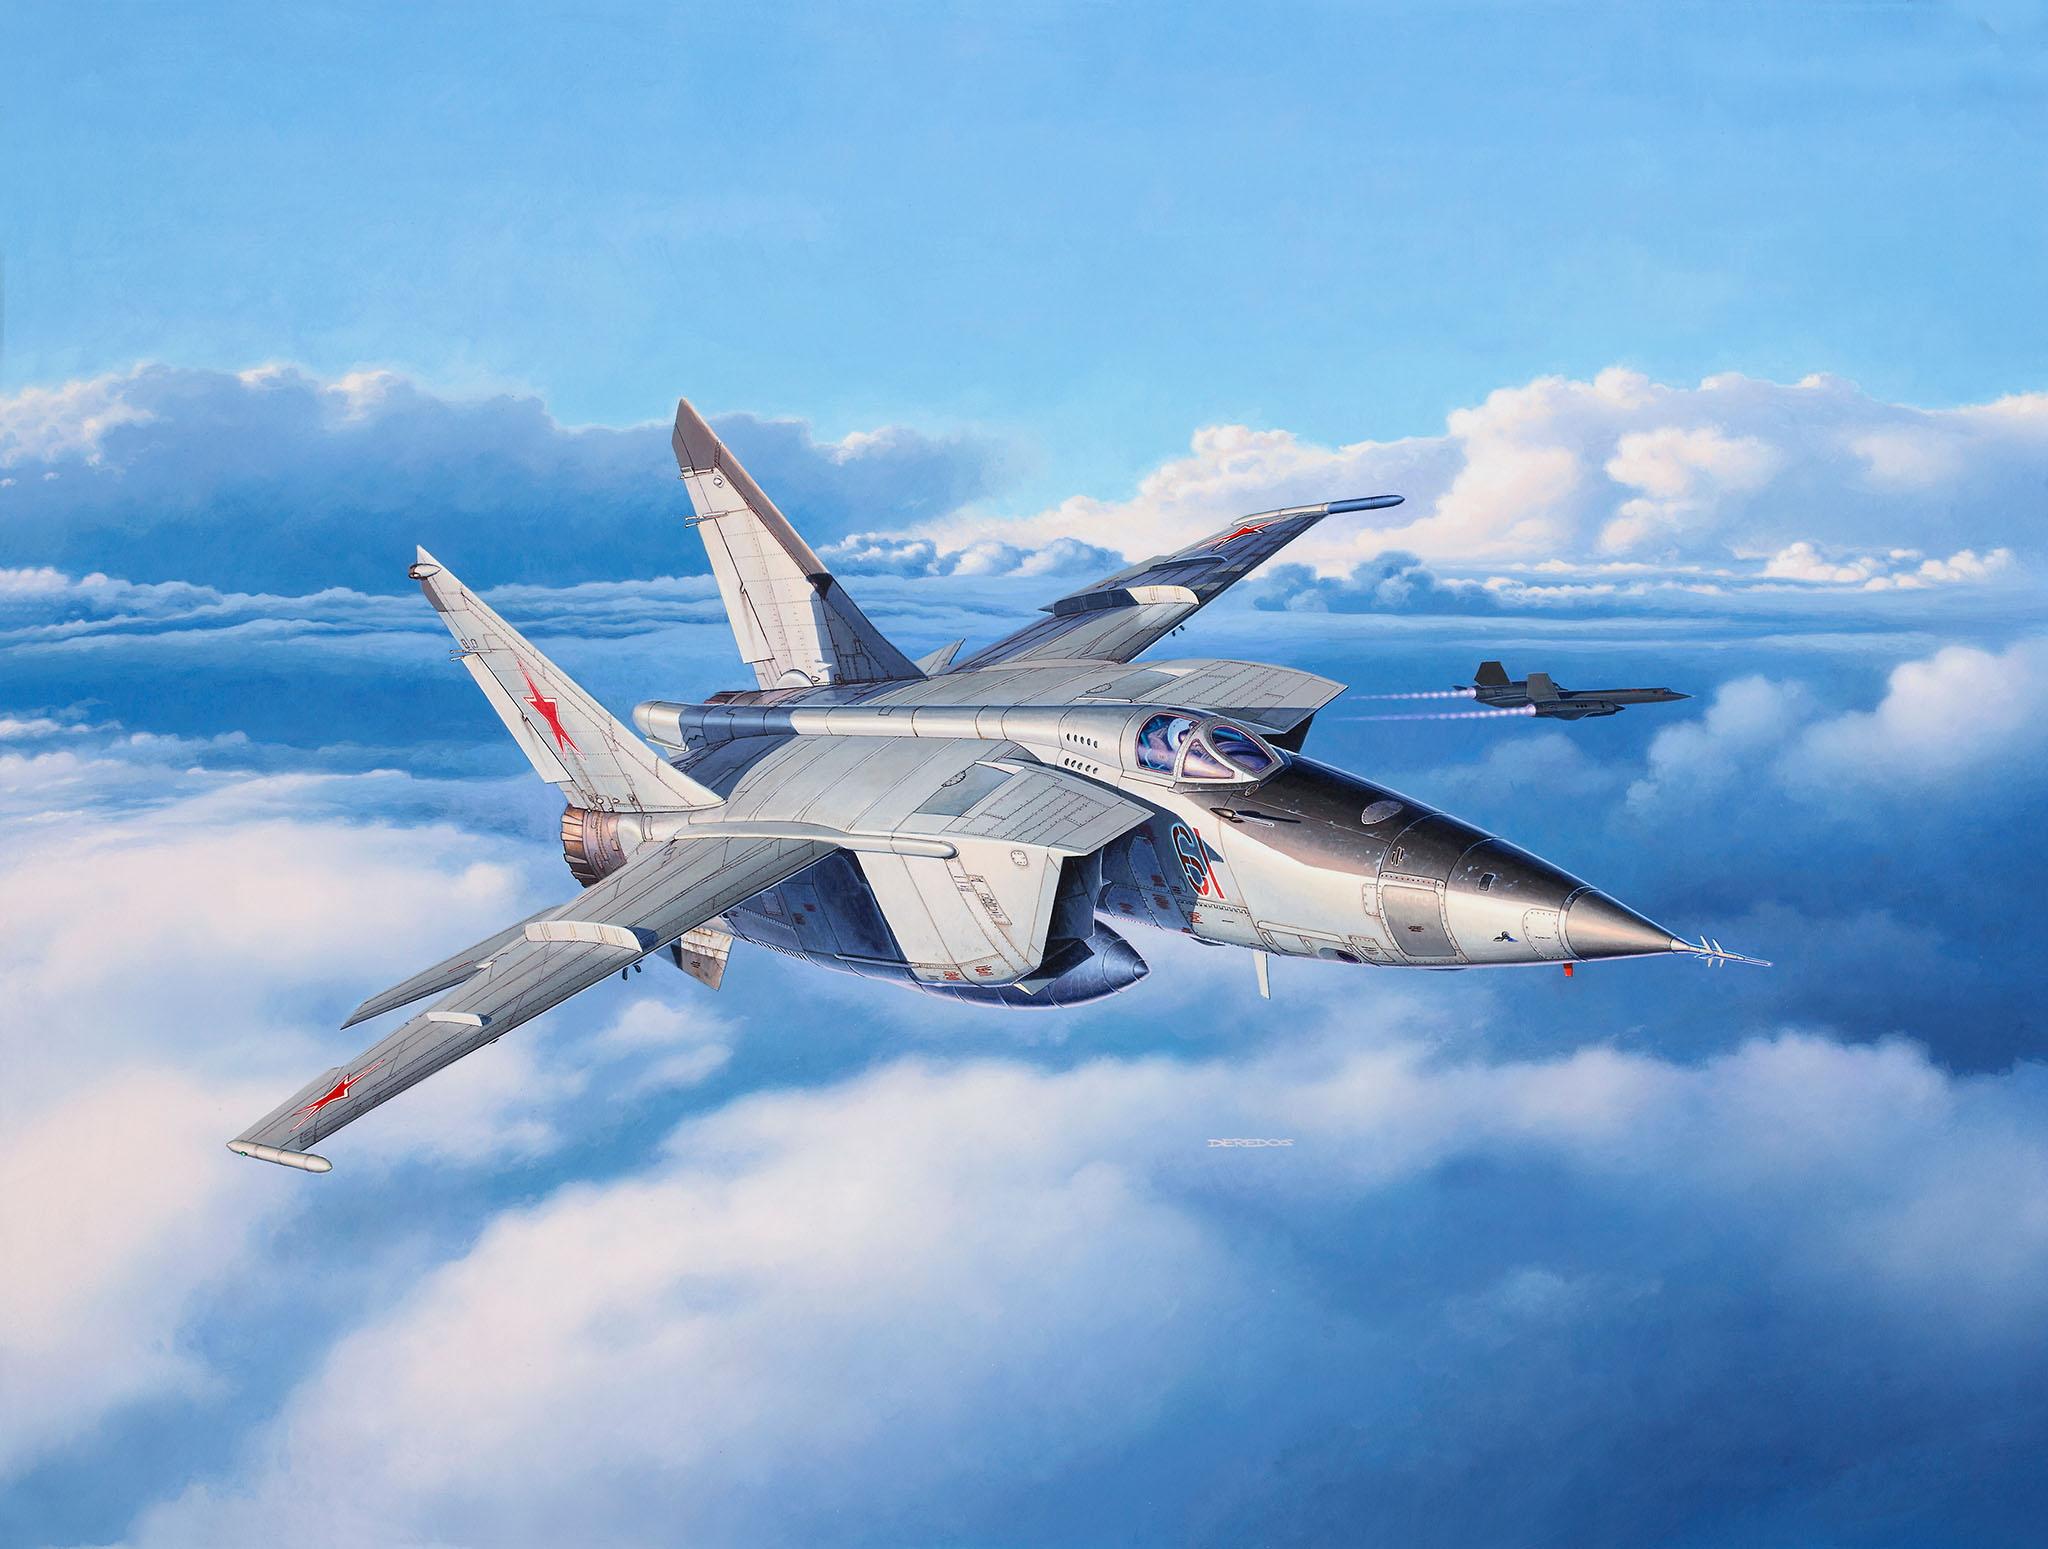 Mikoyan Gurevich MiG 25 HD Wallpaper Background Image 2048x1549